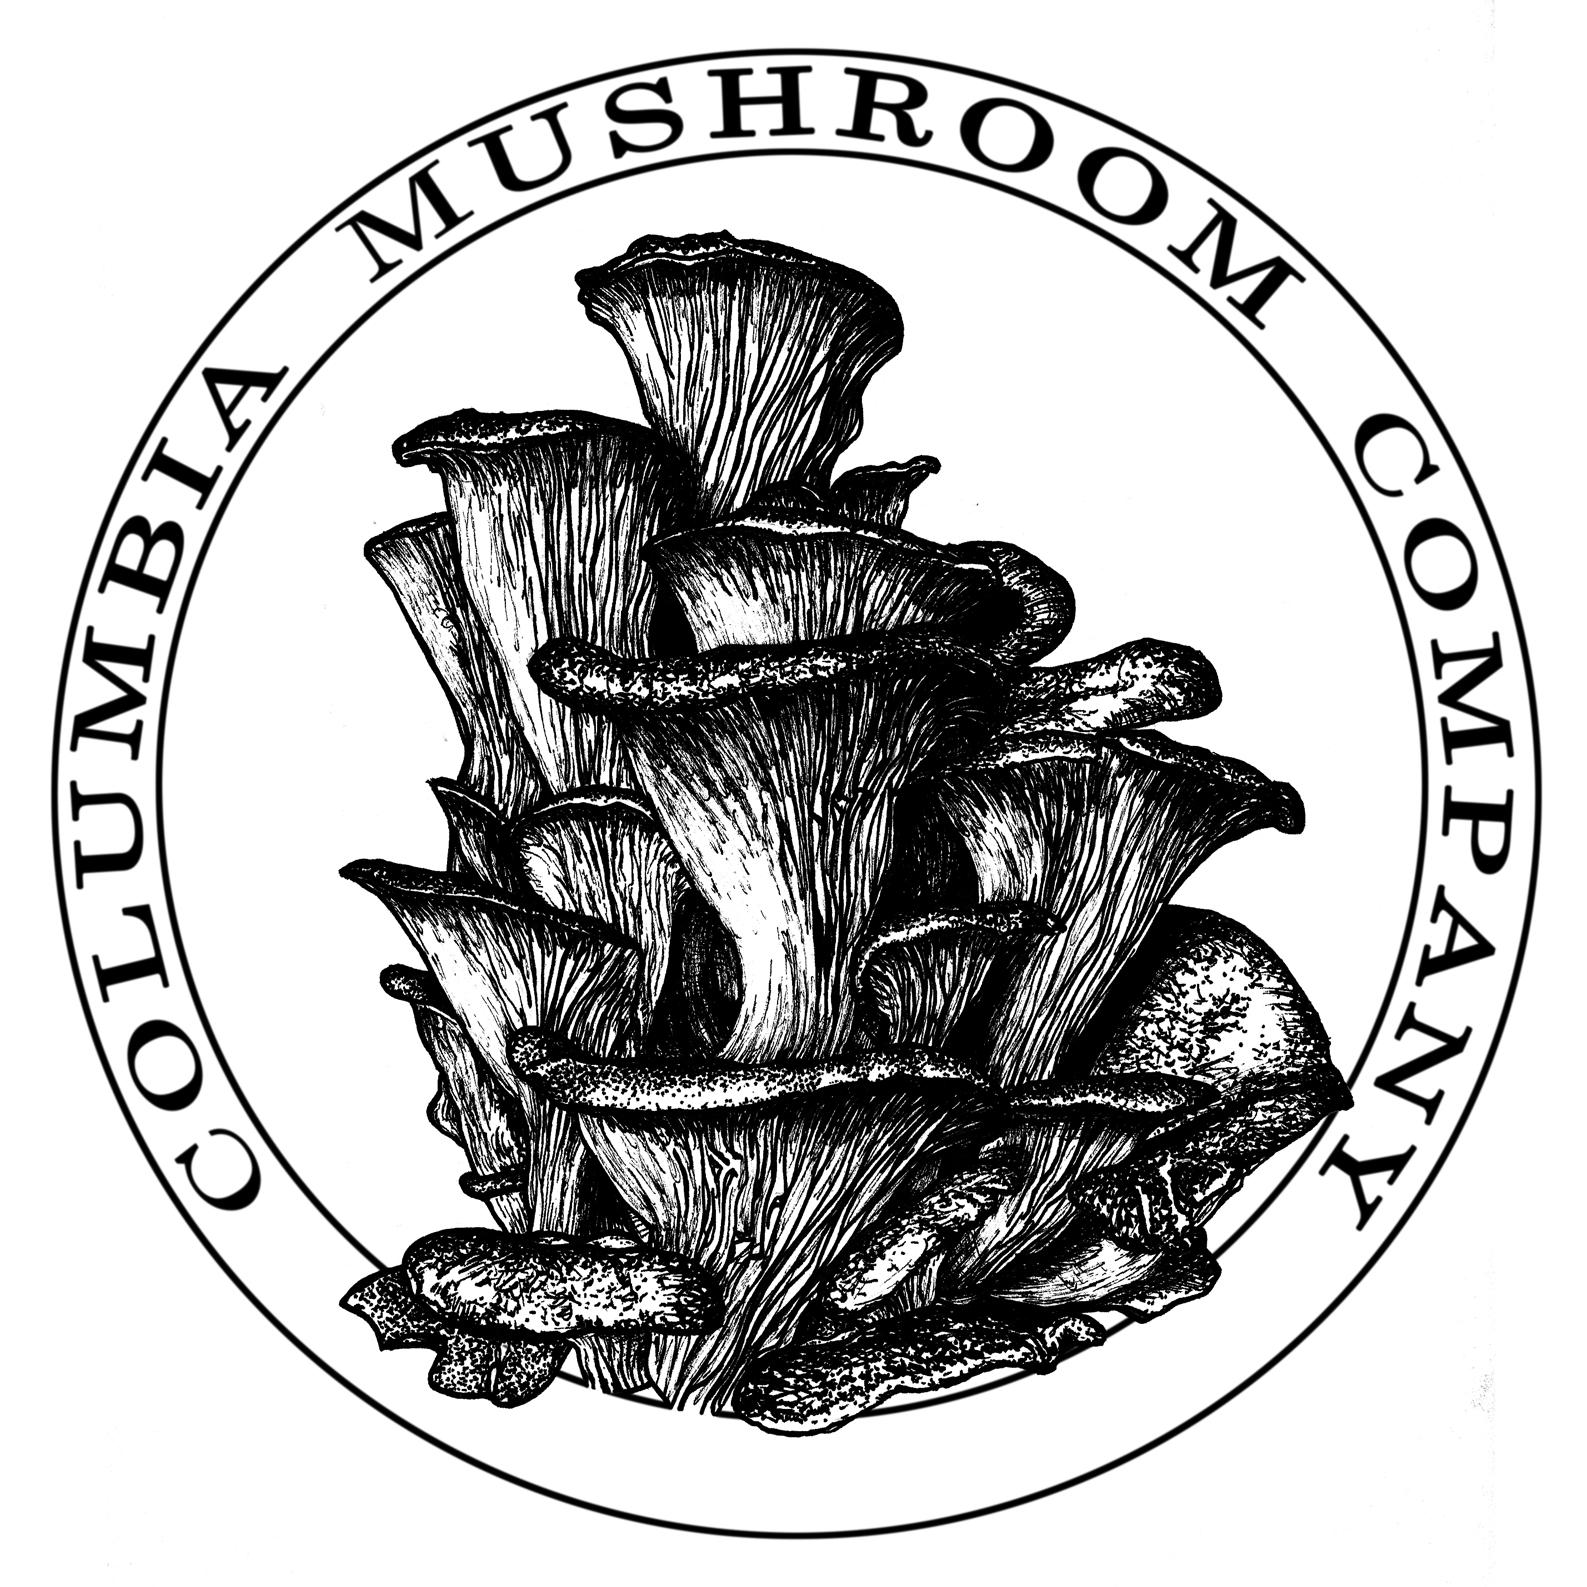 Columbia Mushroom Company